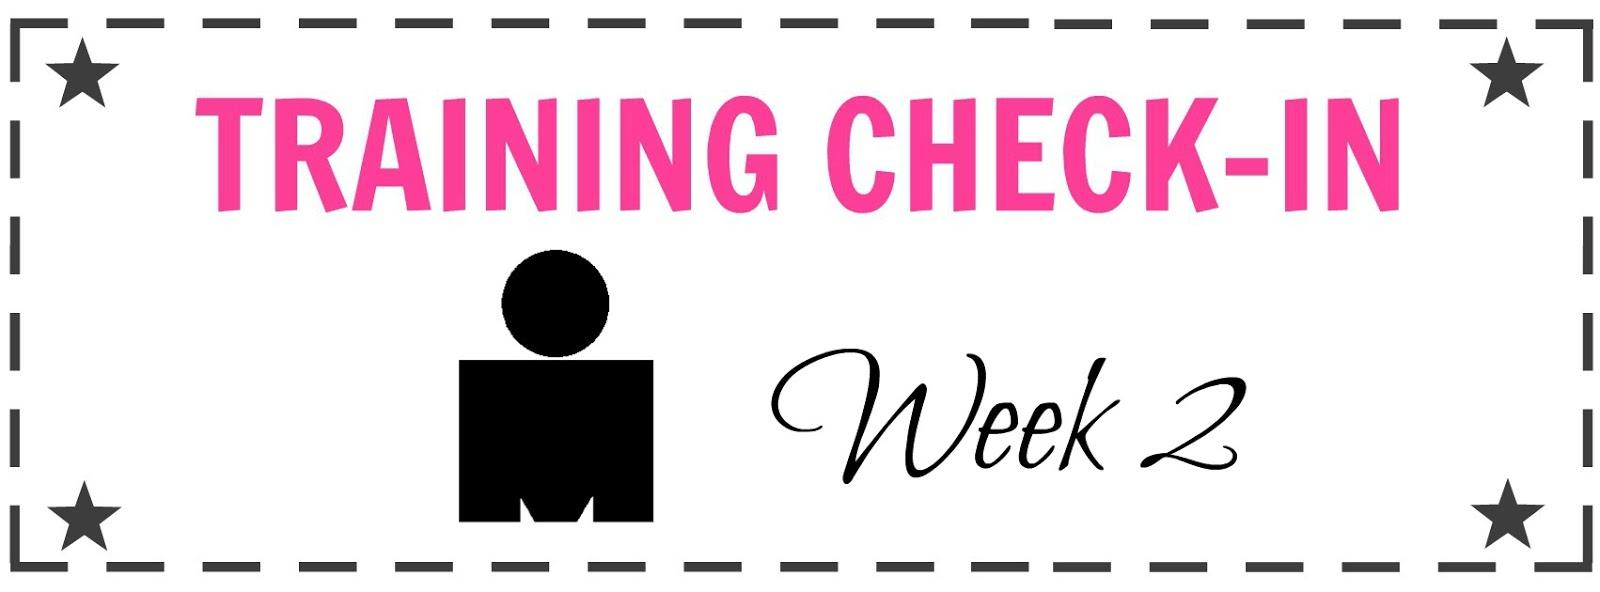 Training Check-in: Ironman Week 2